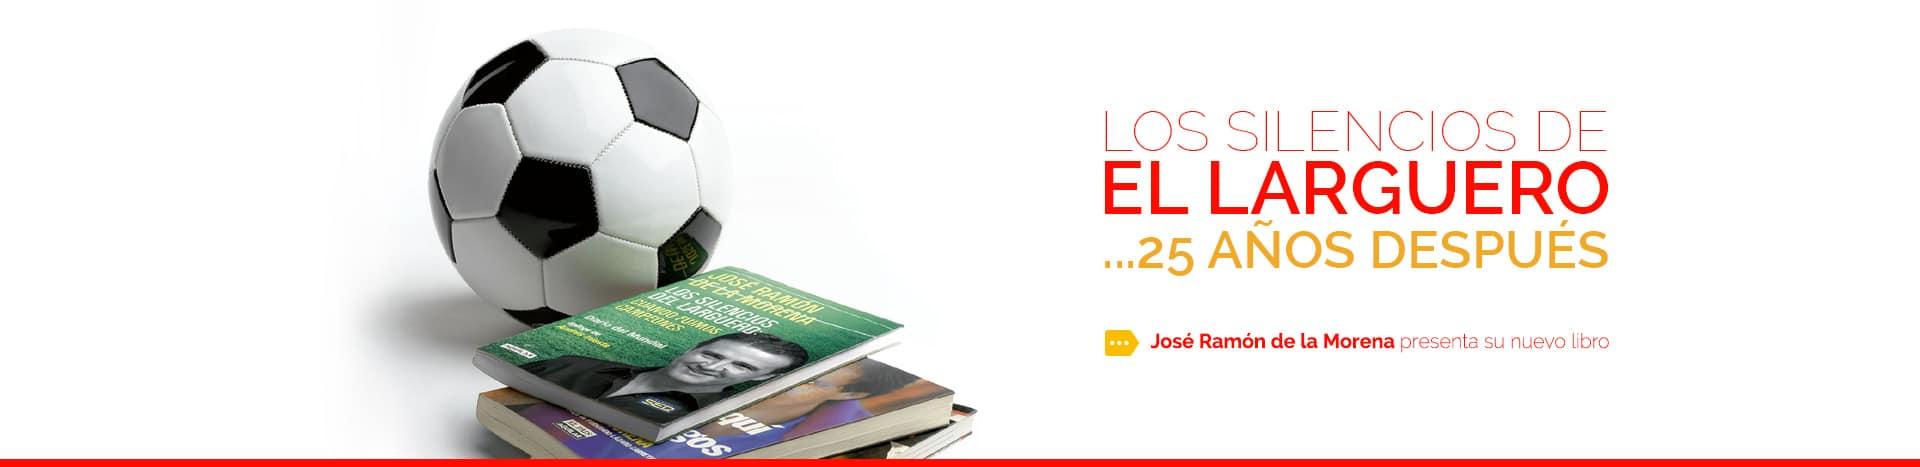 slider-libro-fundacion-larguero